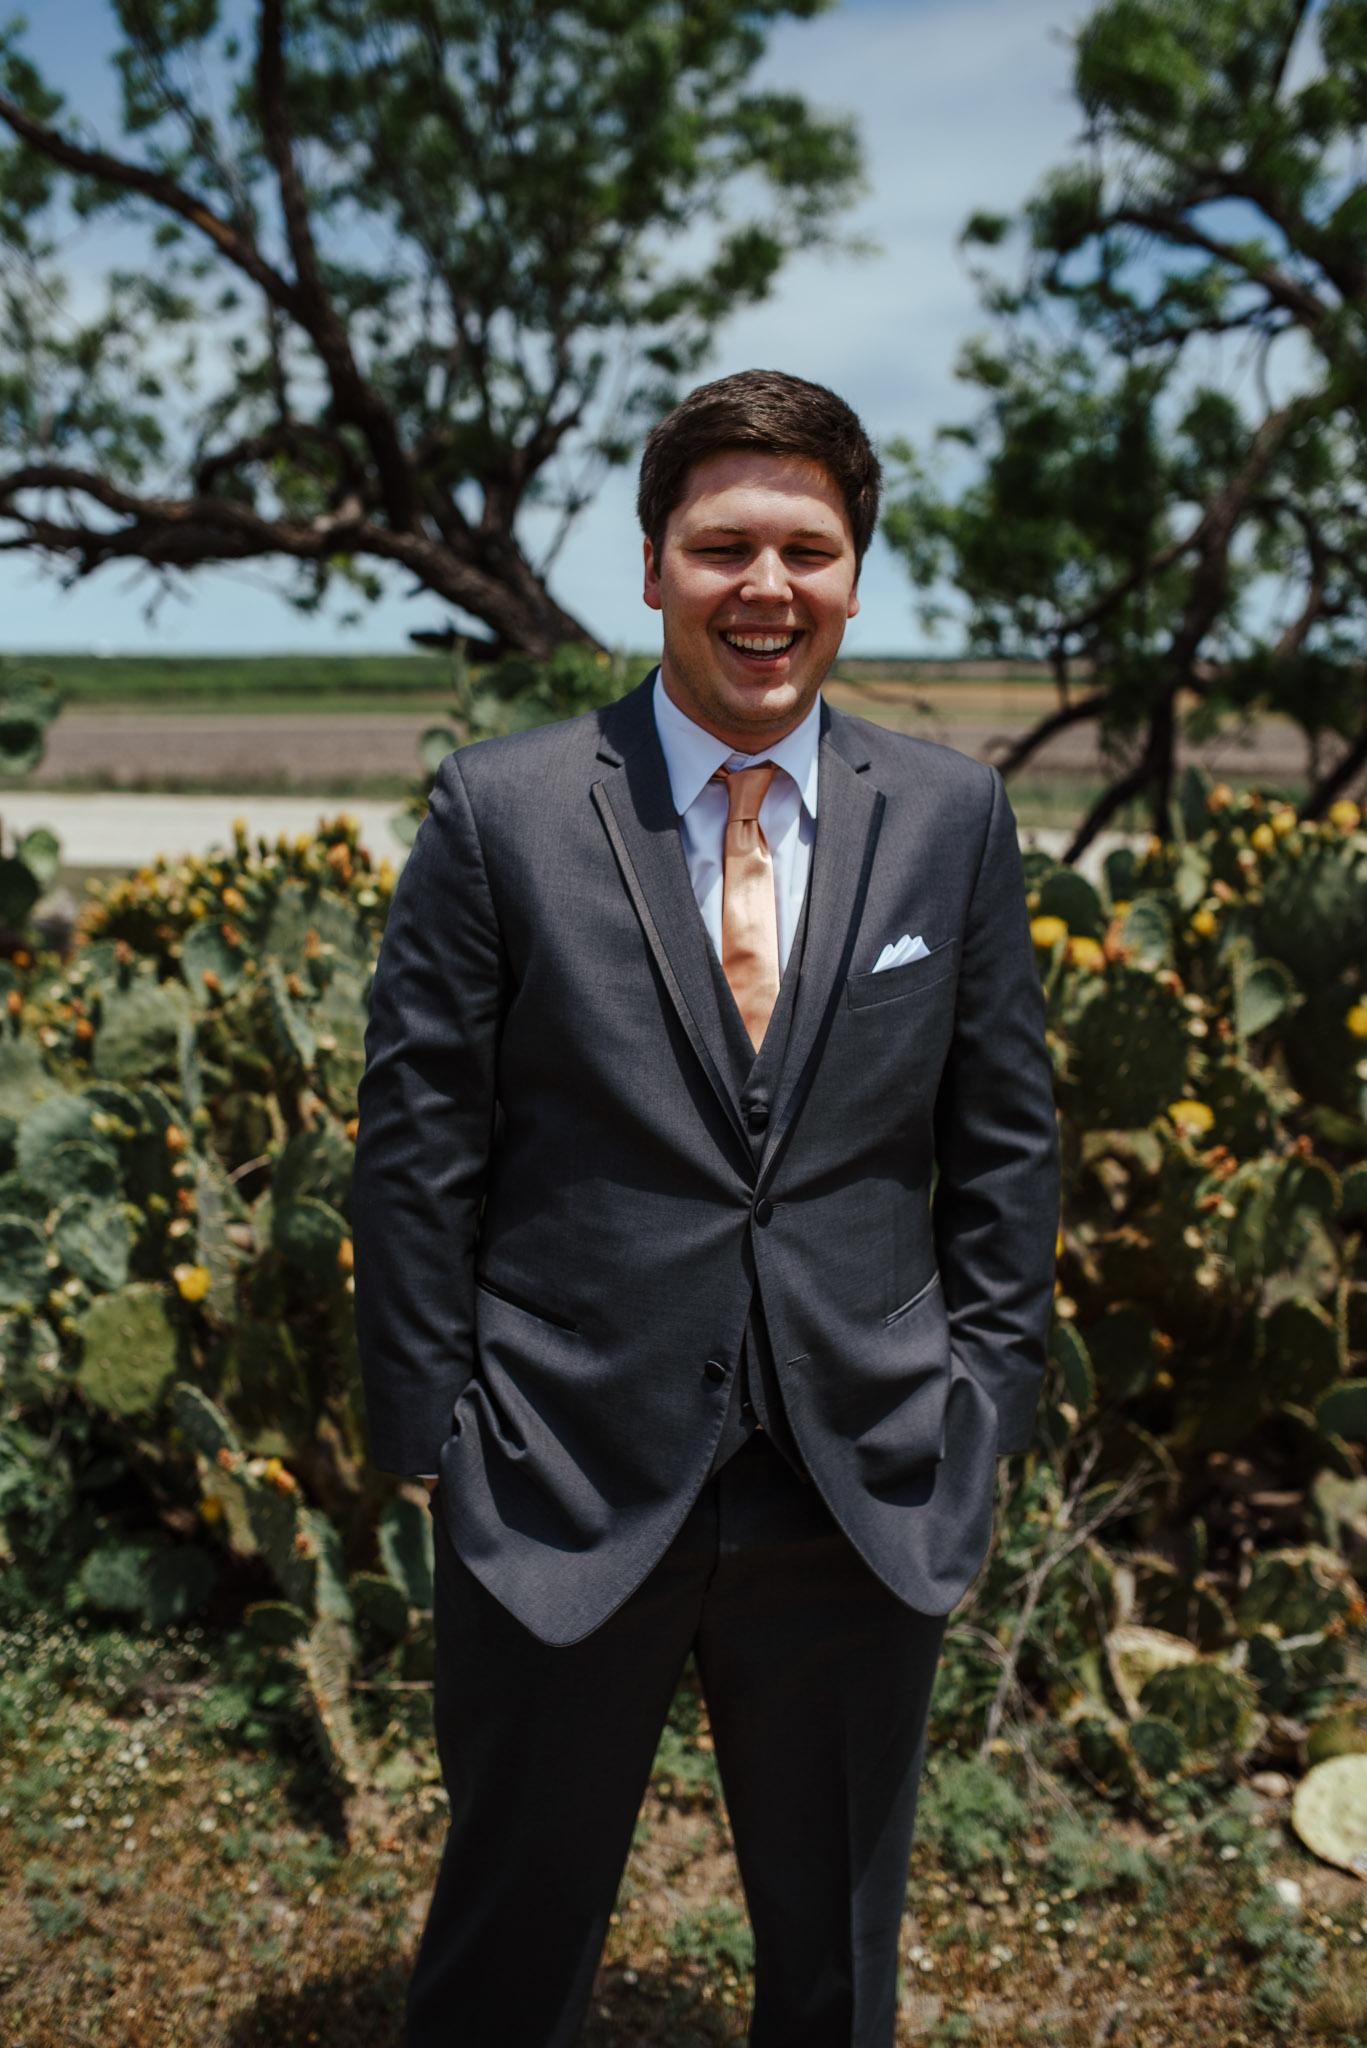 West-Texas-Wedding-Photographer-0008.jpg